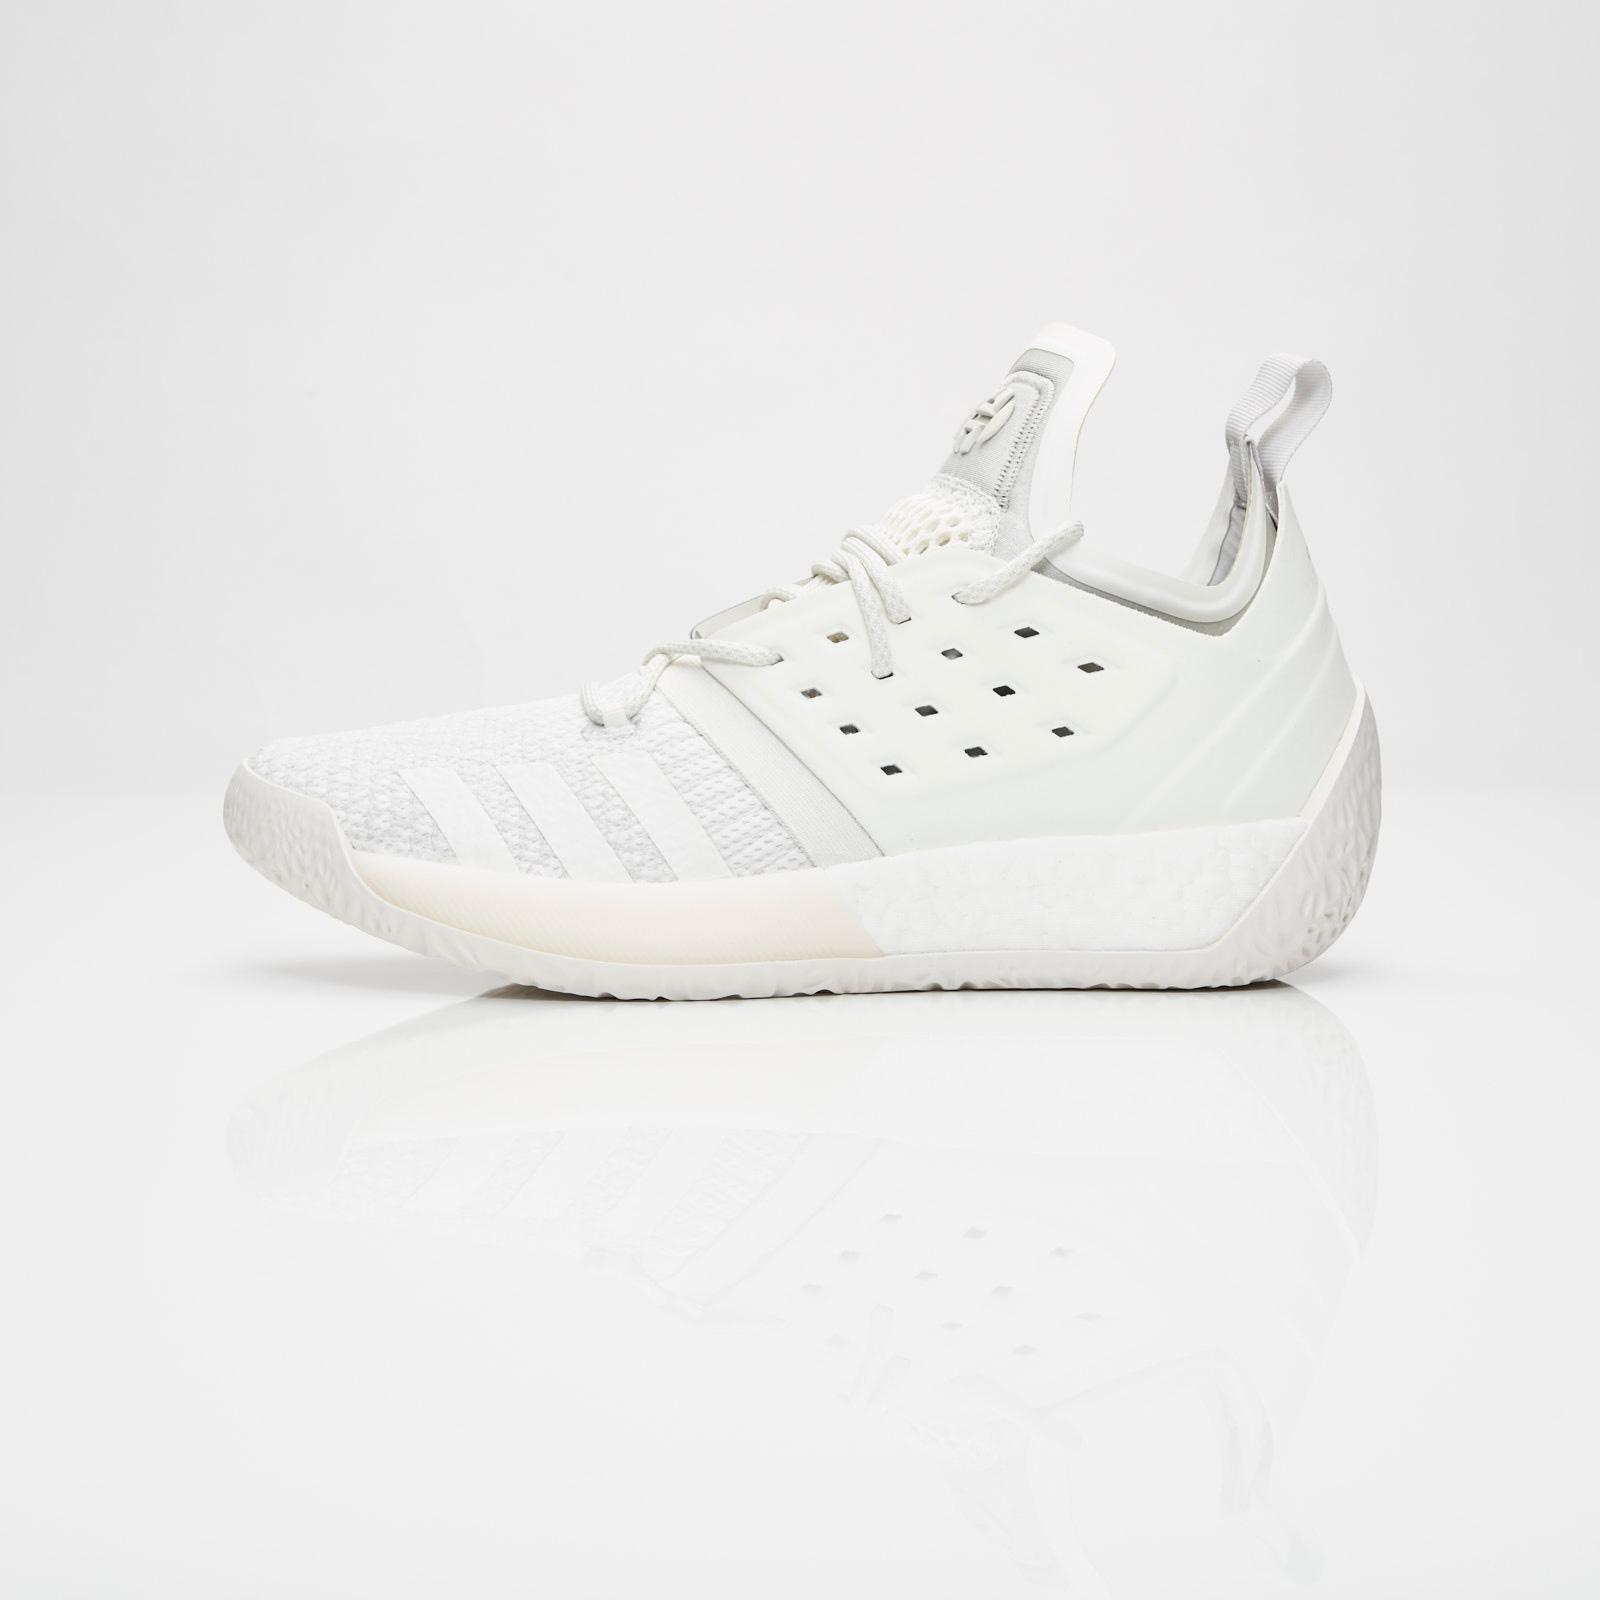 452e2a7c4cb6 adidas Harden Vol. 2 - Ap9871 - Sneakersnstuff